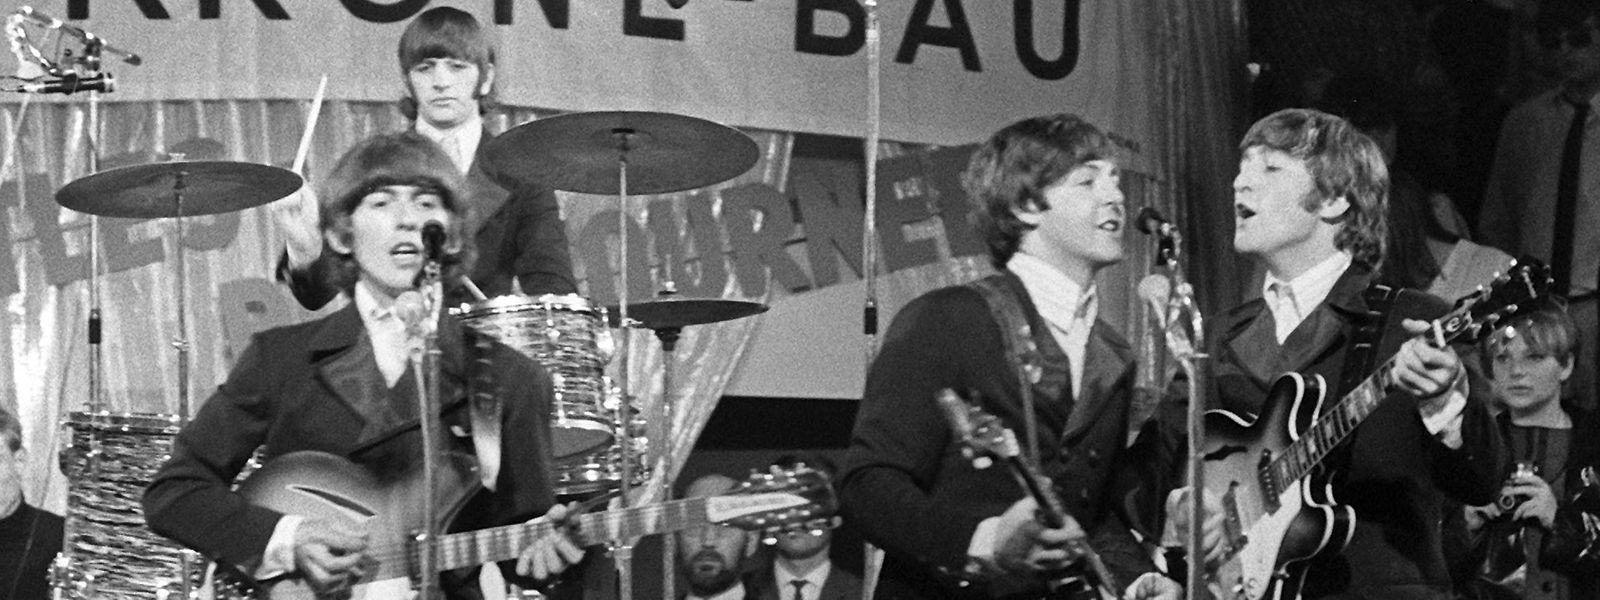 Die Beatles 1966 im Münchner Zirkus Krone.